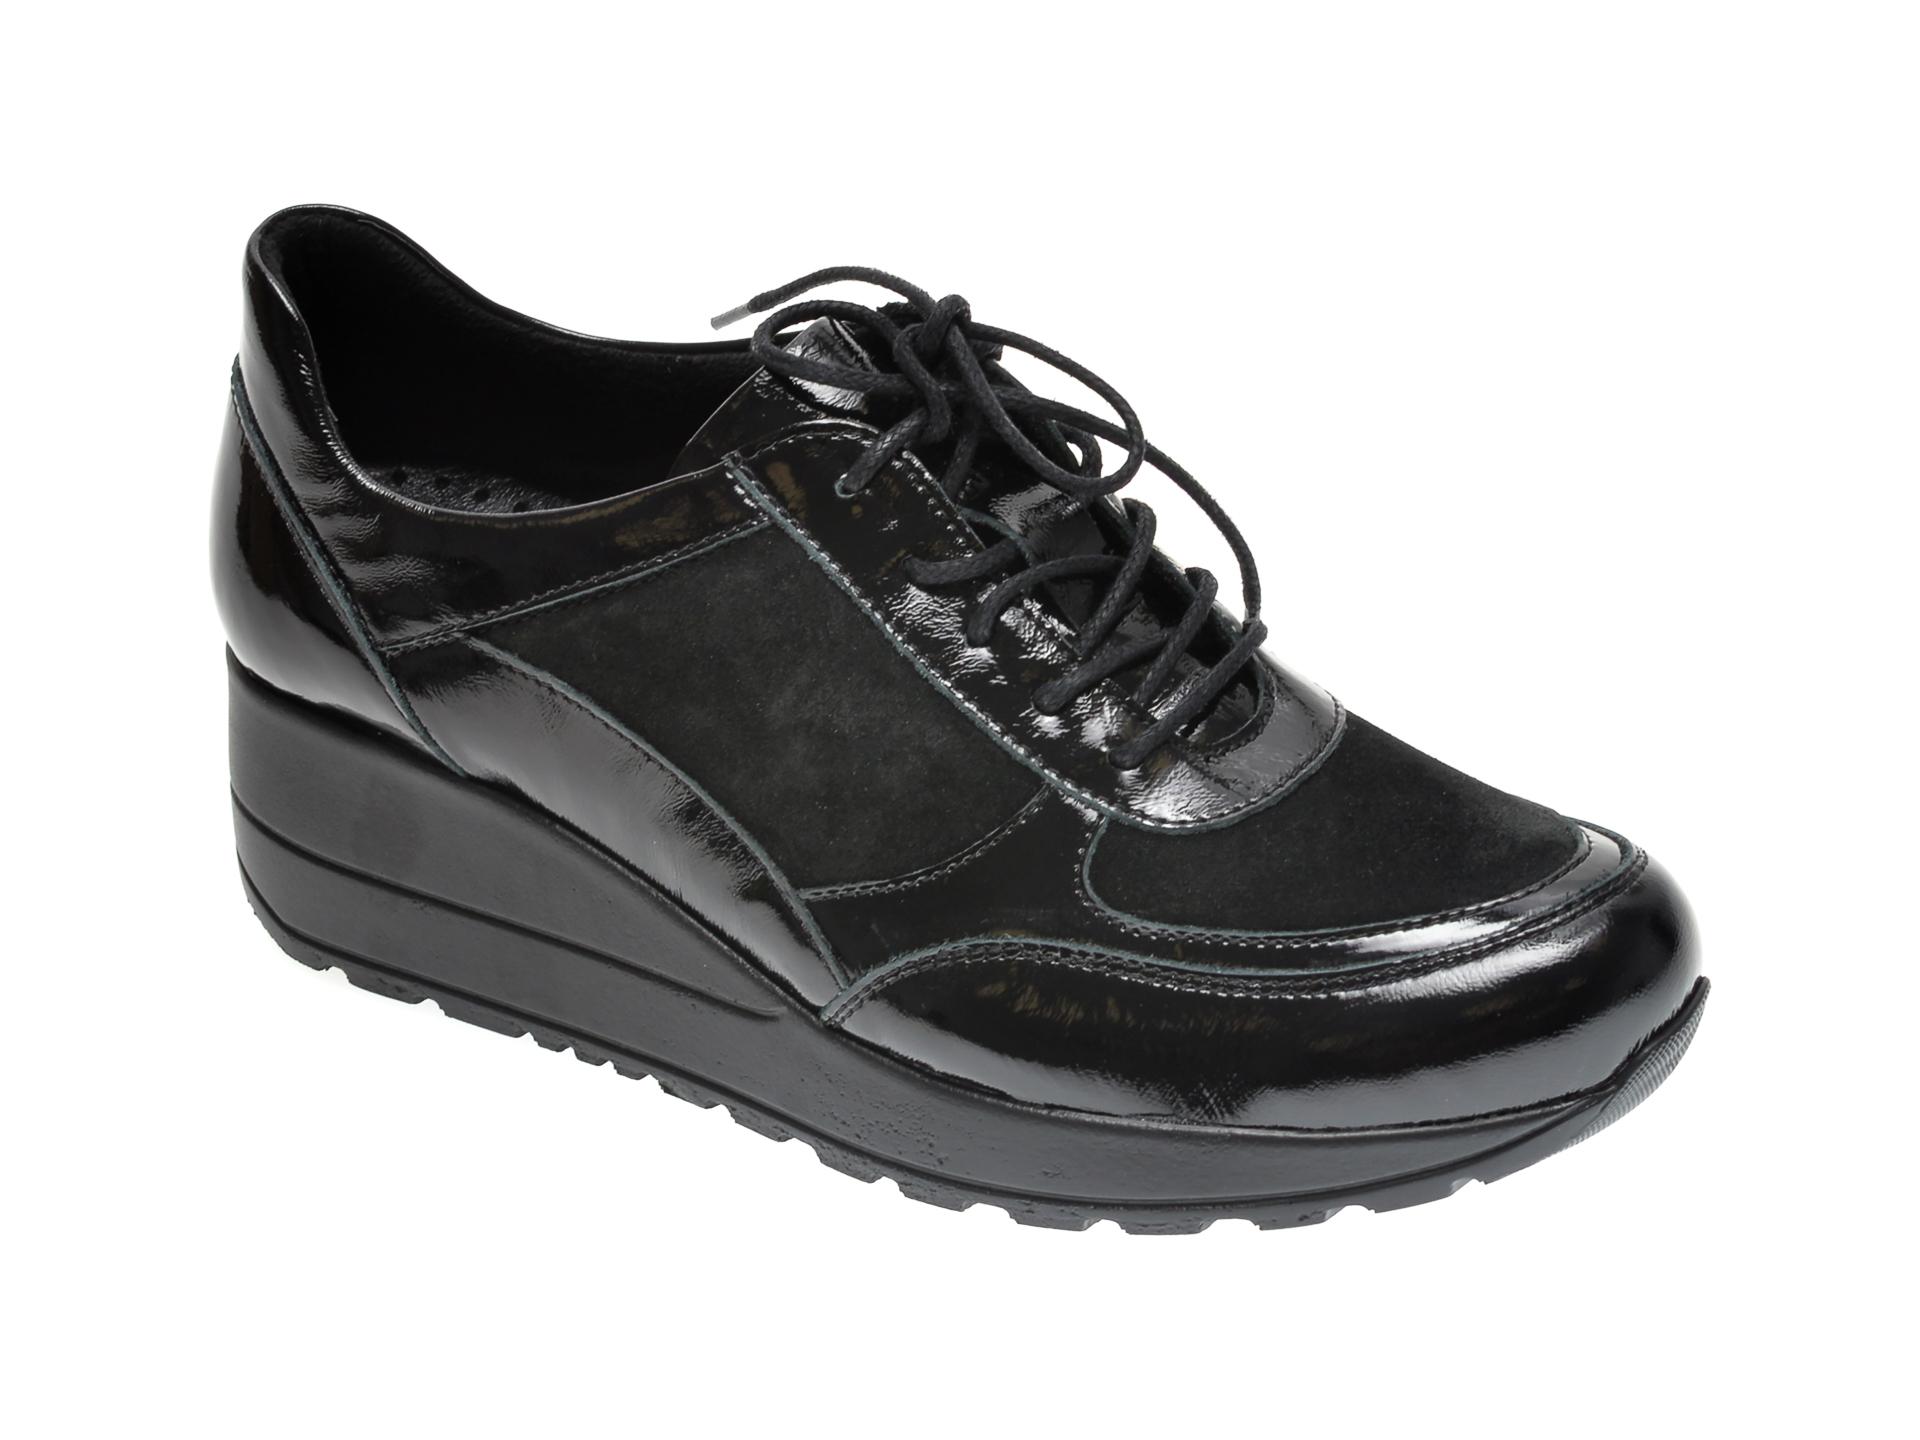 Pantofi ILOZ negri, 6026, din piele naturala lacuita imagine